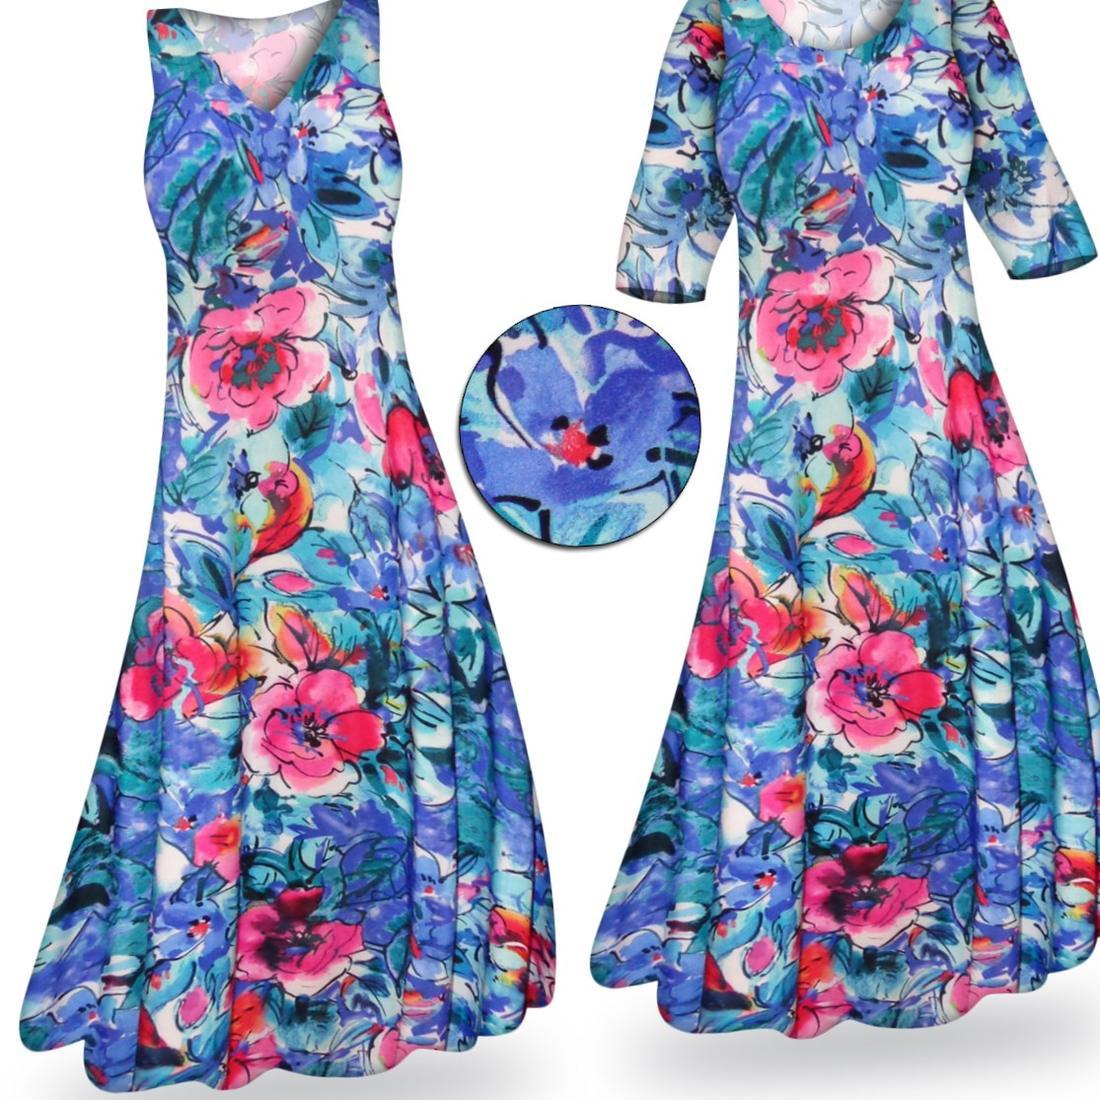 Hawaiian dress plus size - Luau Style: PlusLook.eu Collection